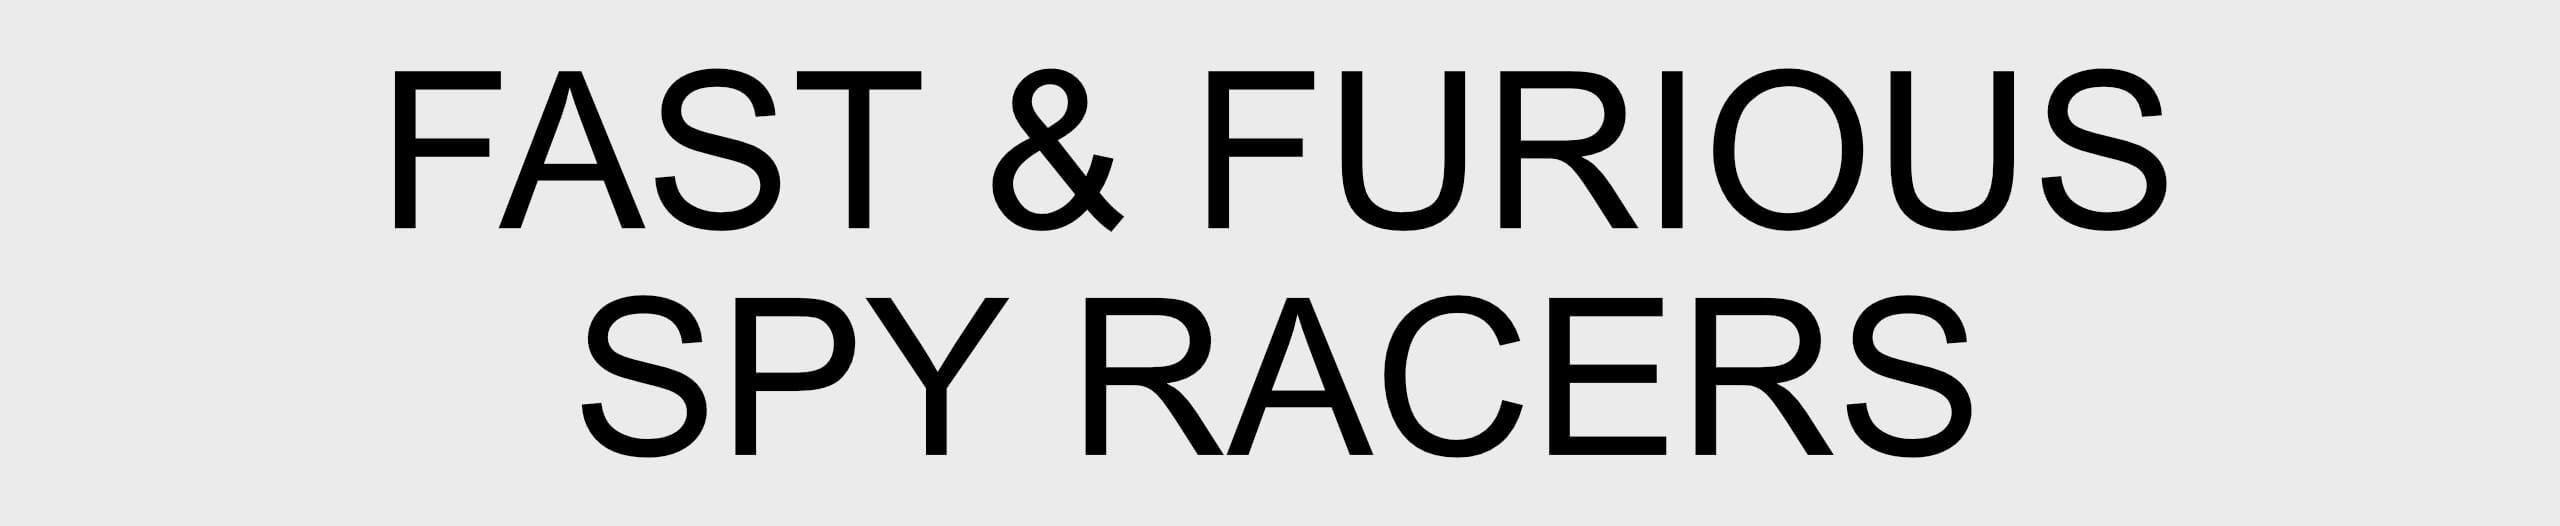 Fast & Furious - Spy Racers